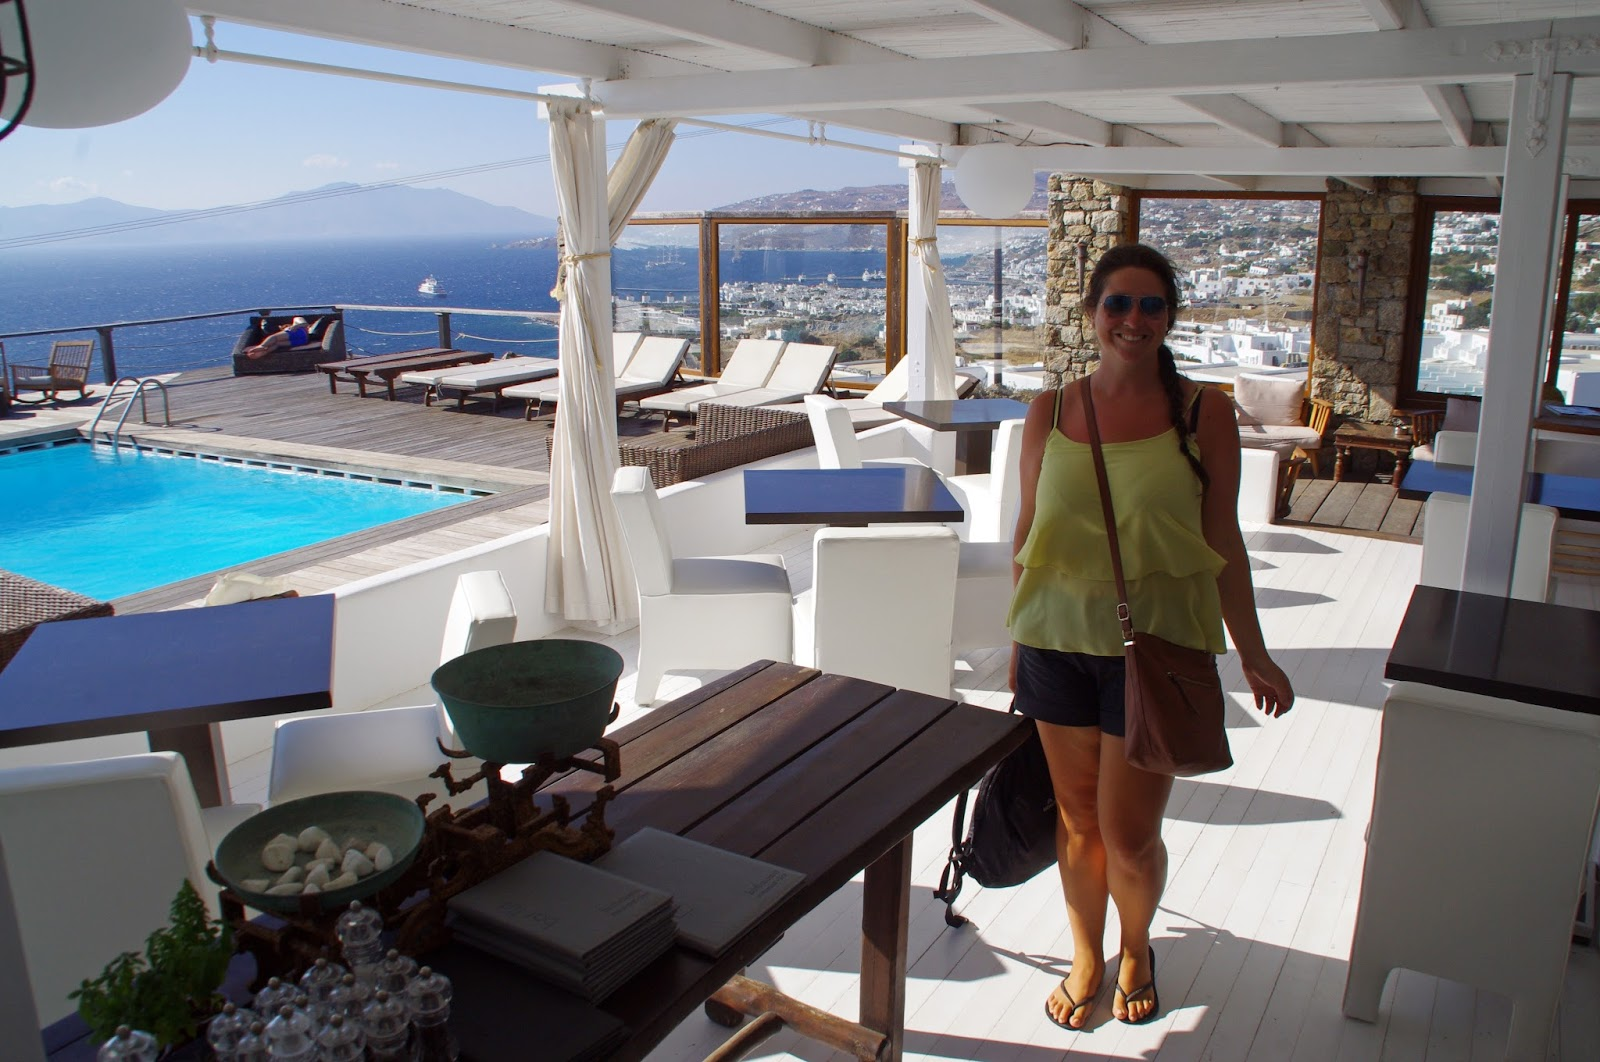 Tharroe of Mykonos Outdoor Restaurant and Terrace Bar